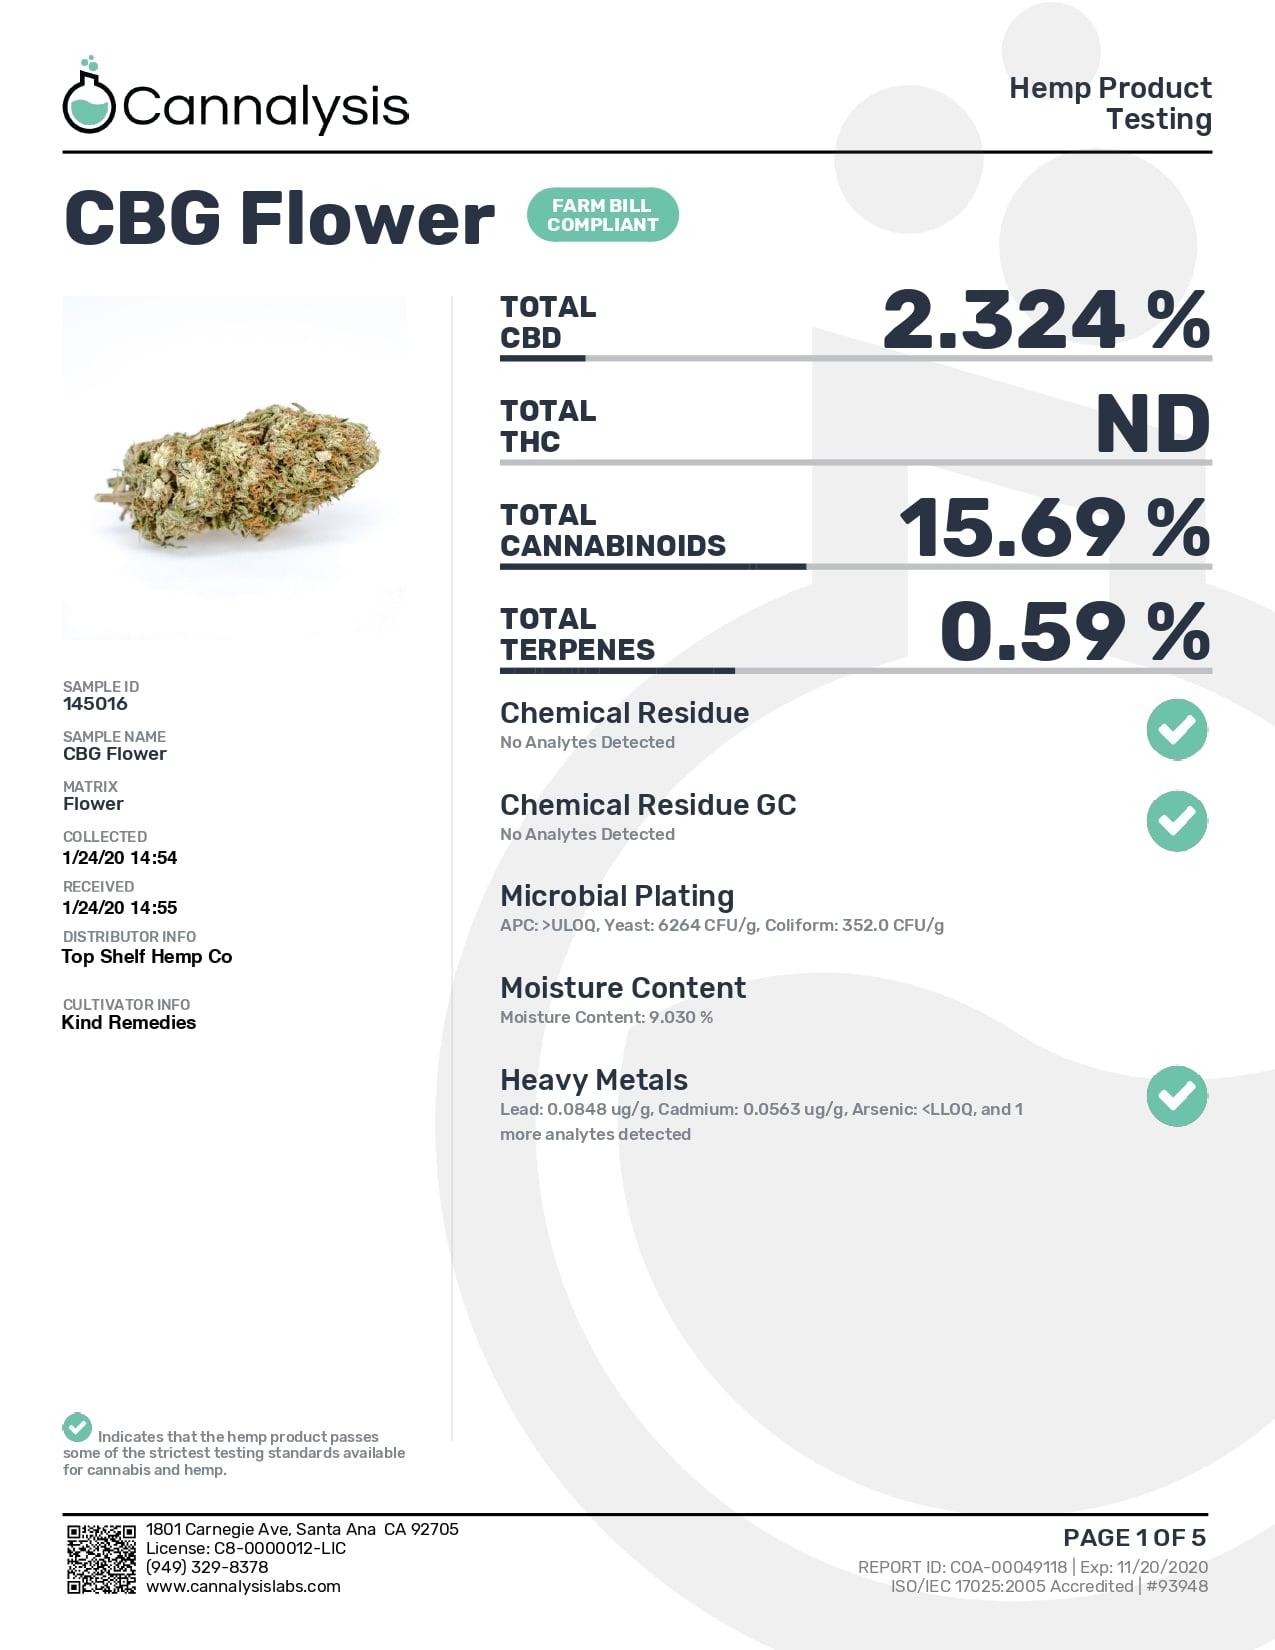 Root Wellness Hemp CBG Bud Bag 4g Lab Report